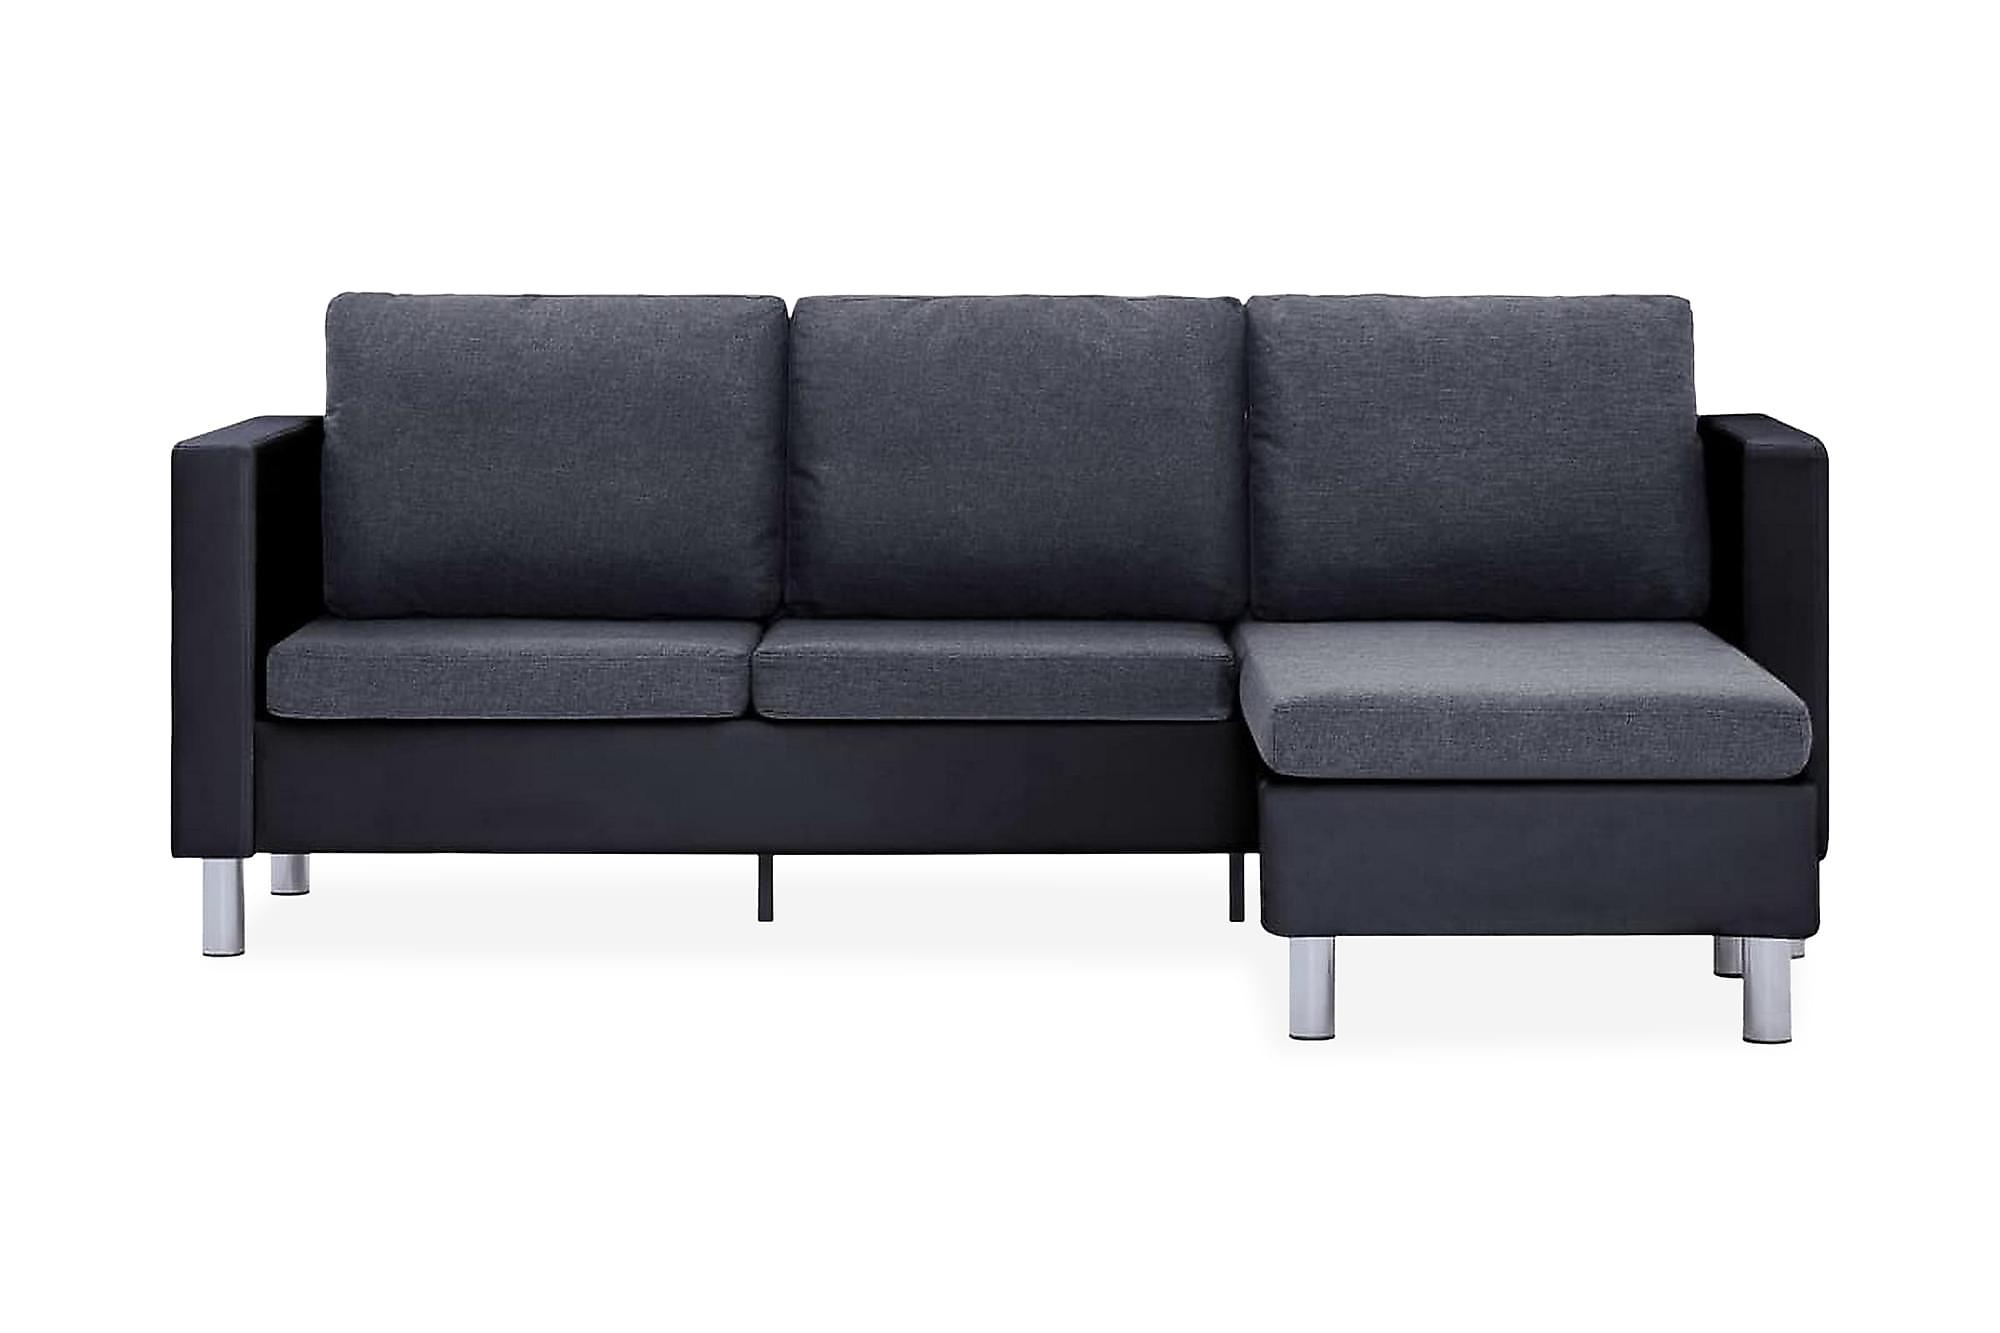 3-sitssoffa med dynor konstläder svart, 3-sits soffor